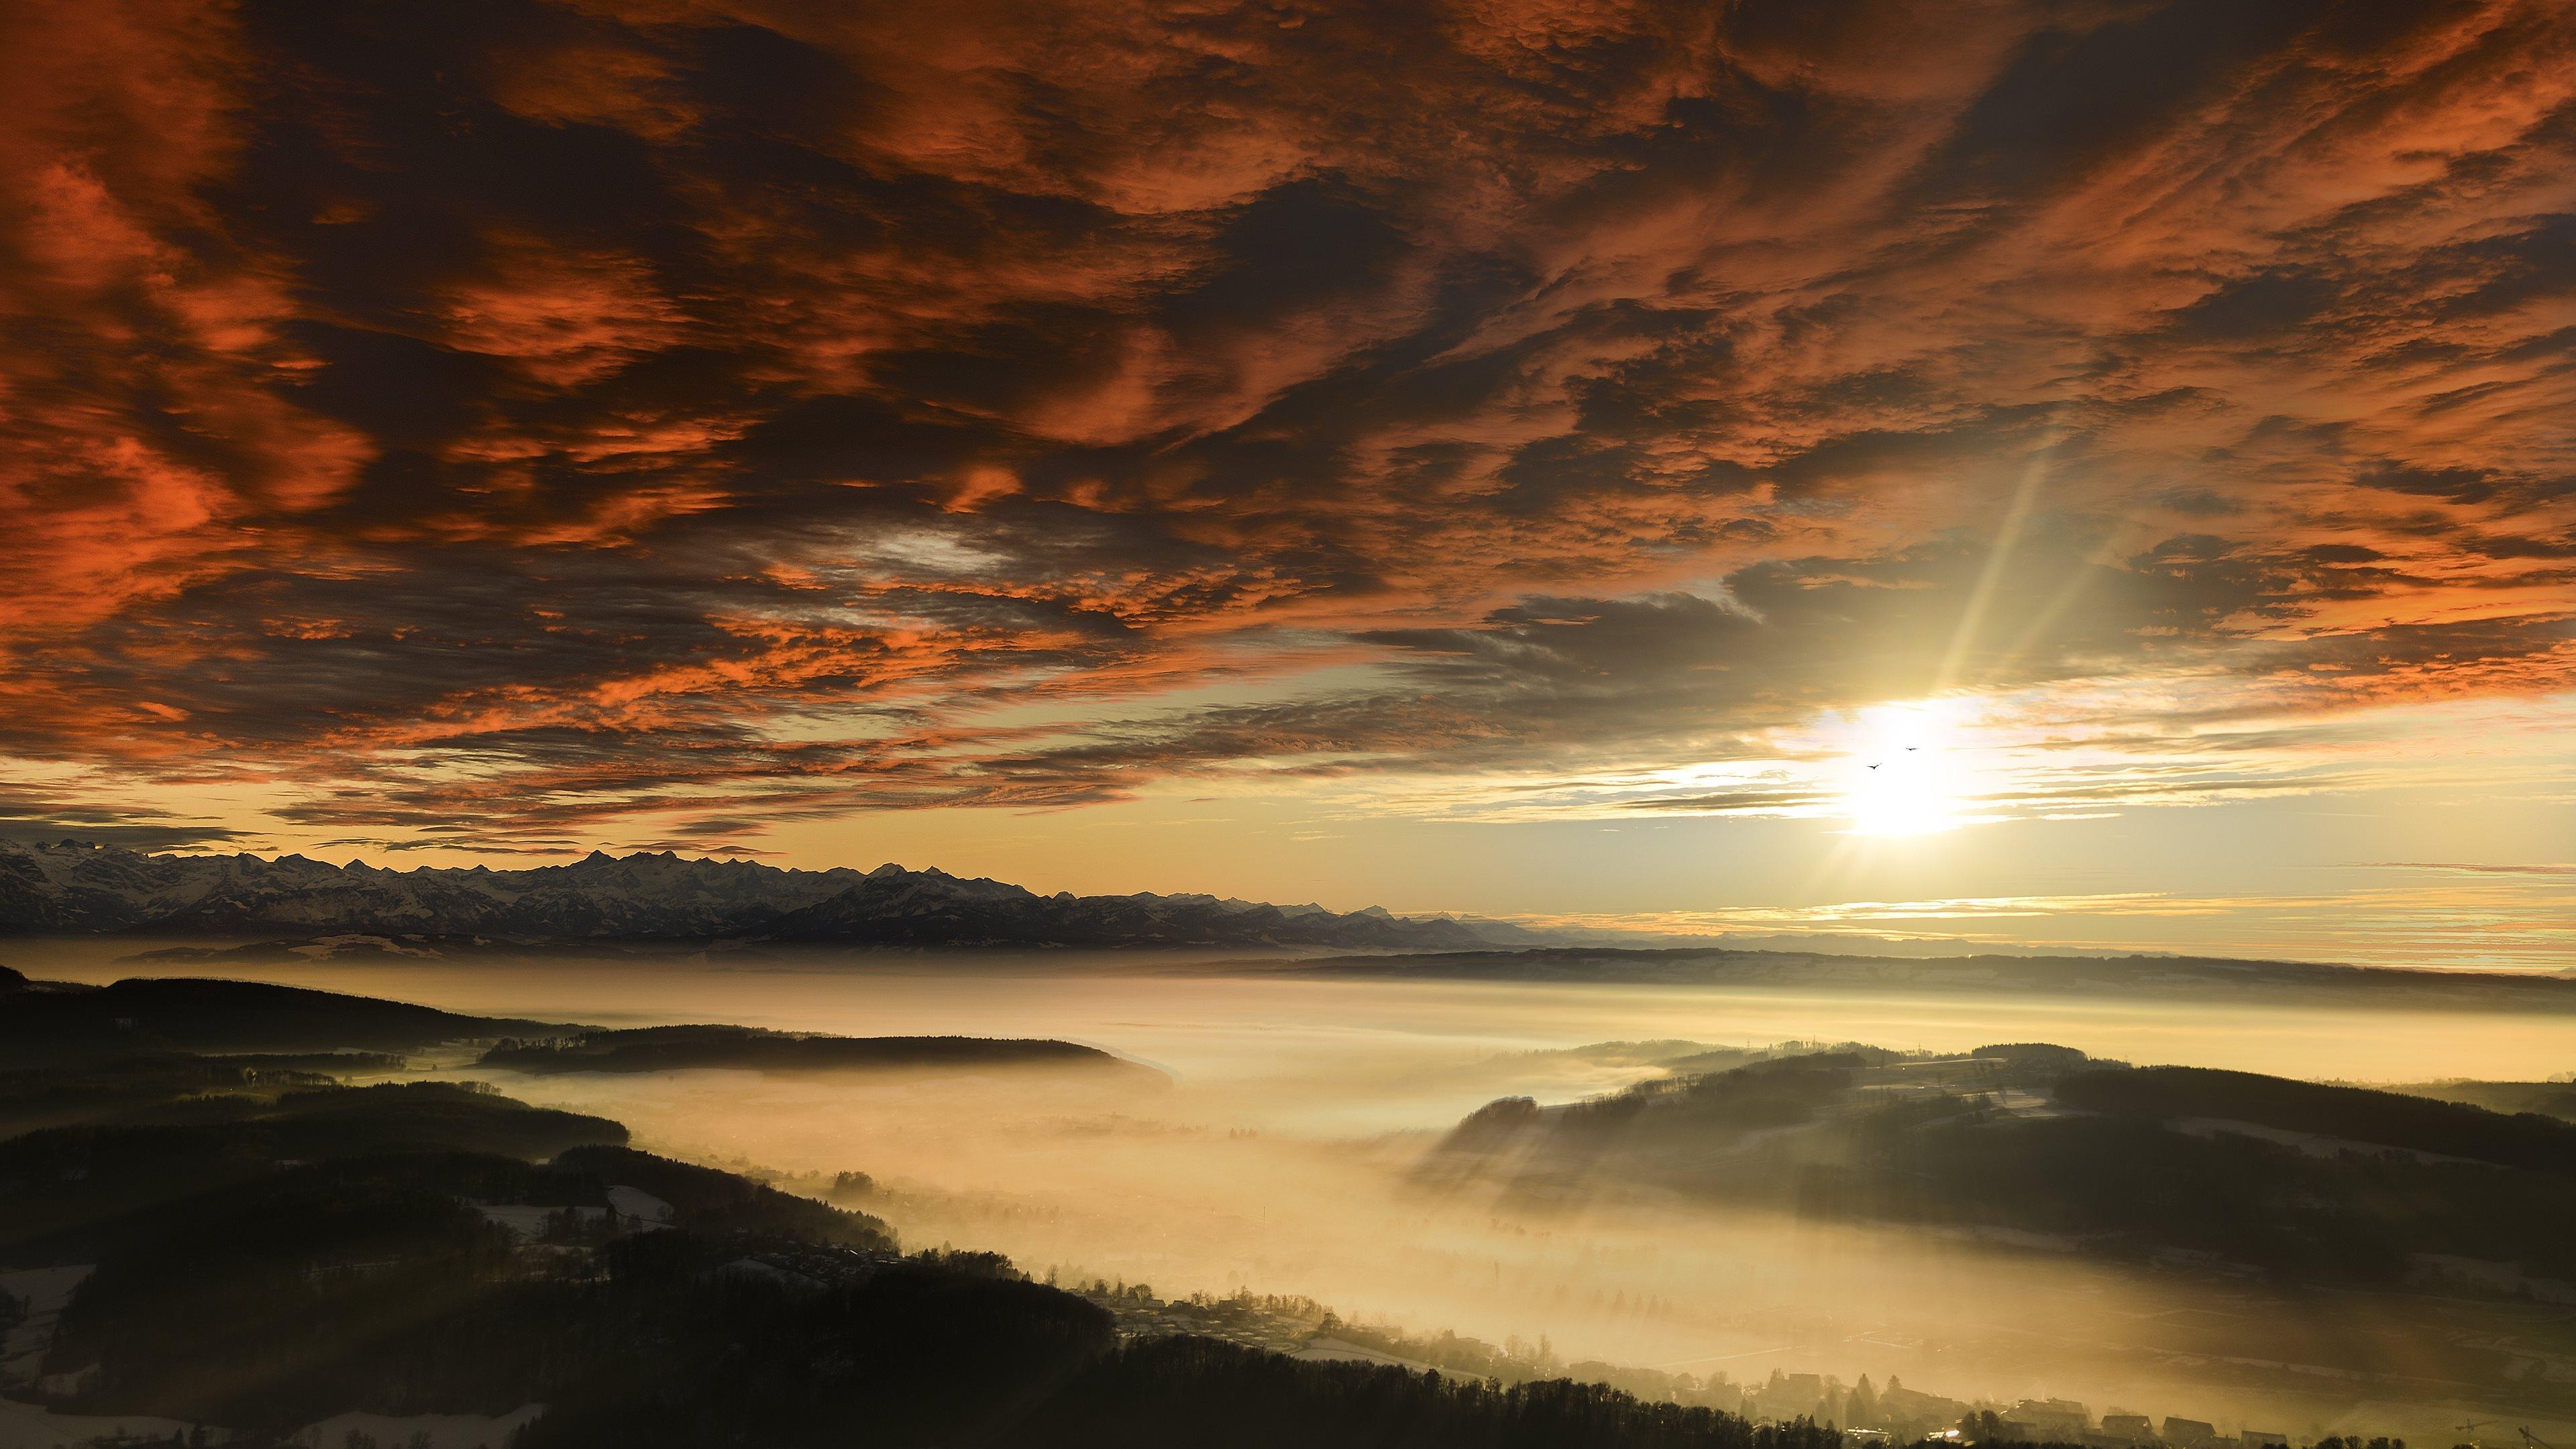 Sunrise Cloud Wallpaper Sunset Sunrise Clouds Fog